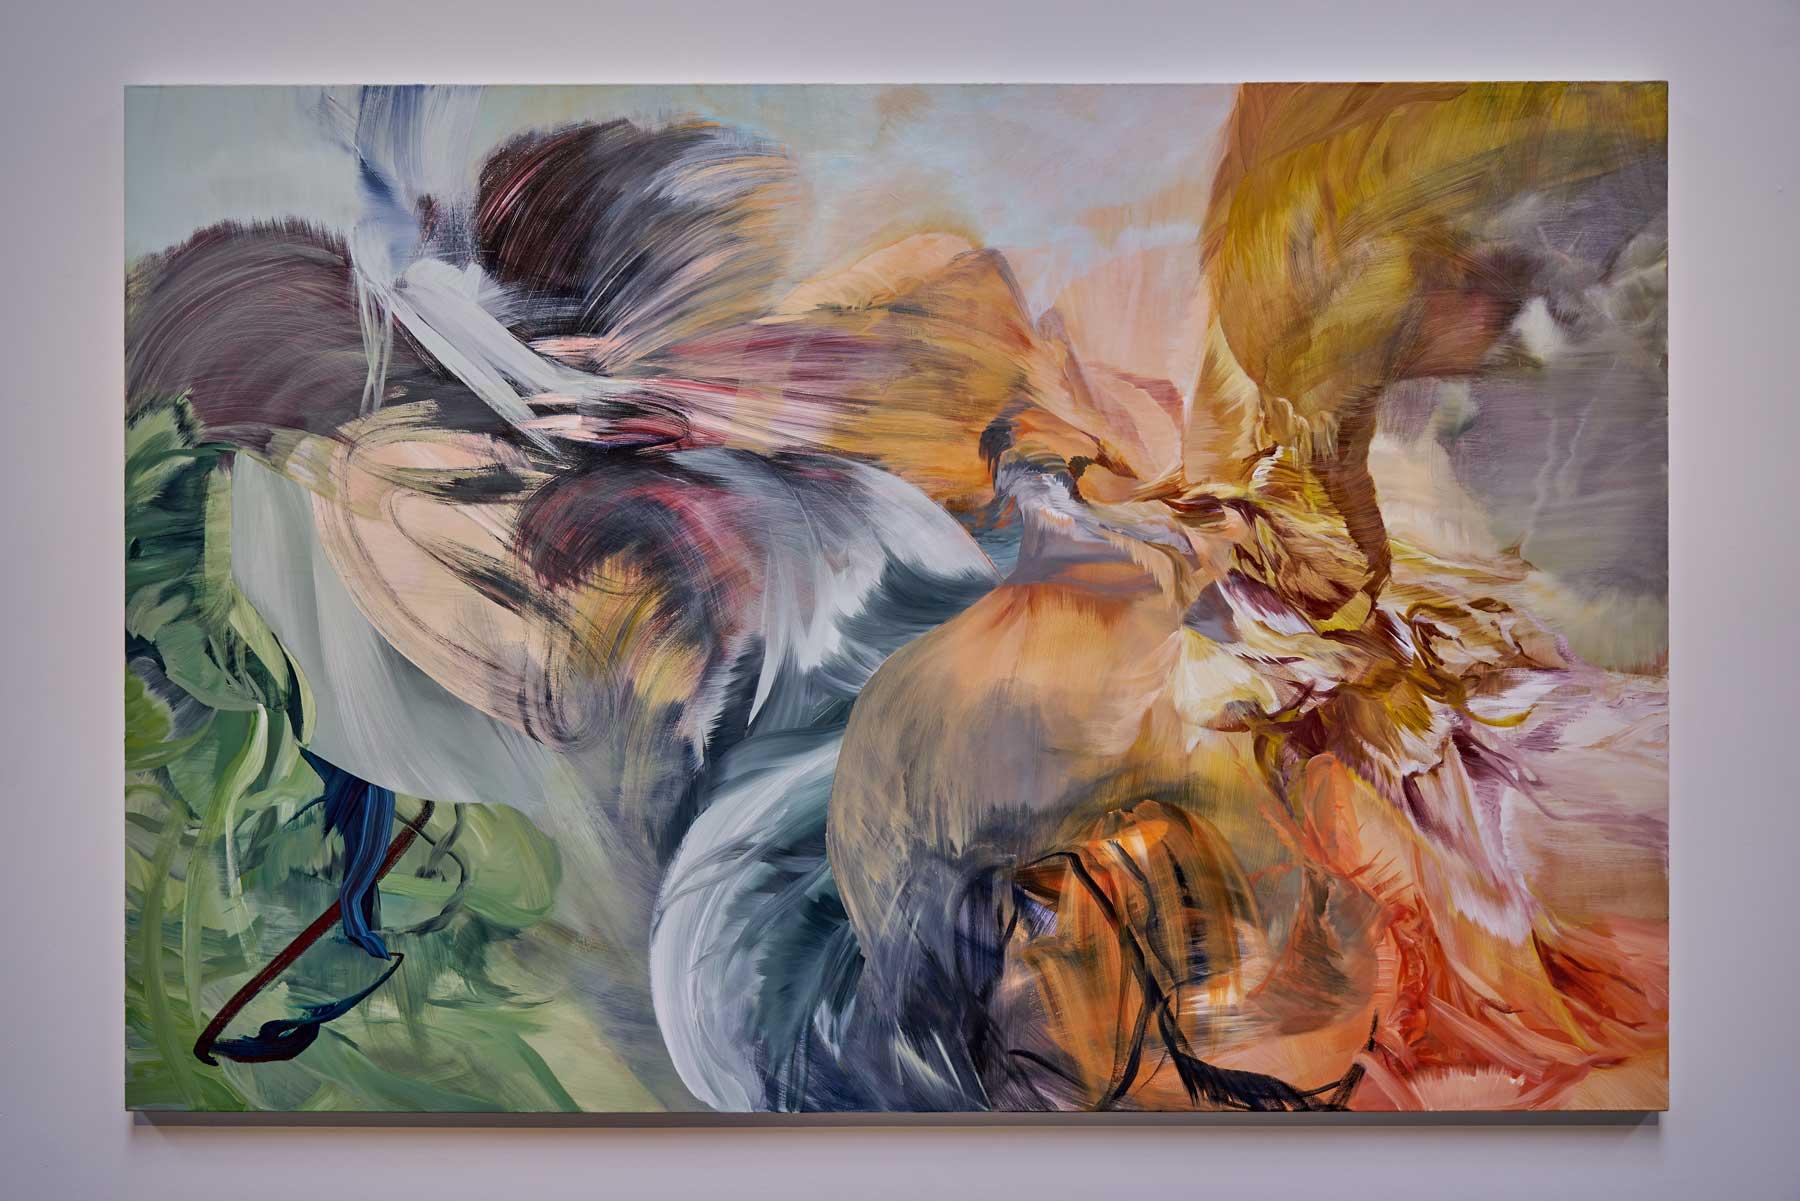 "Melanie Authier,   Chimera , 2016, Acrylic on canvas, 72"" x 108"" (182,9 x 274,3 cm)"